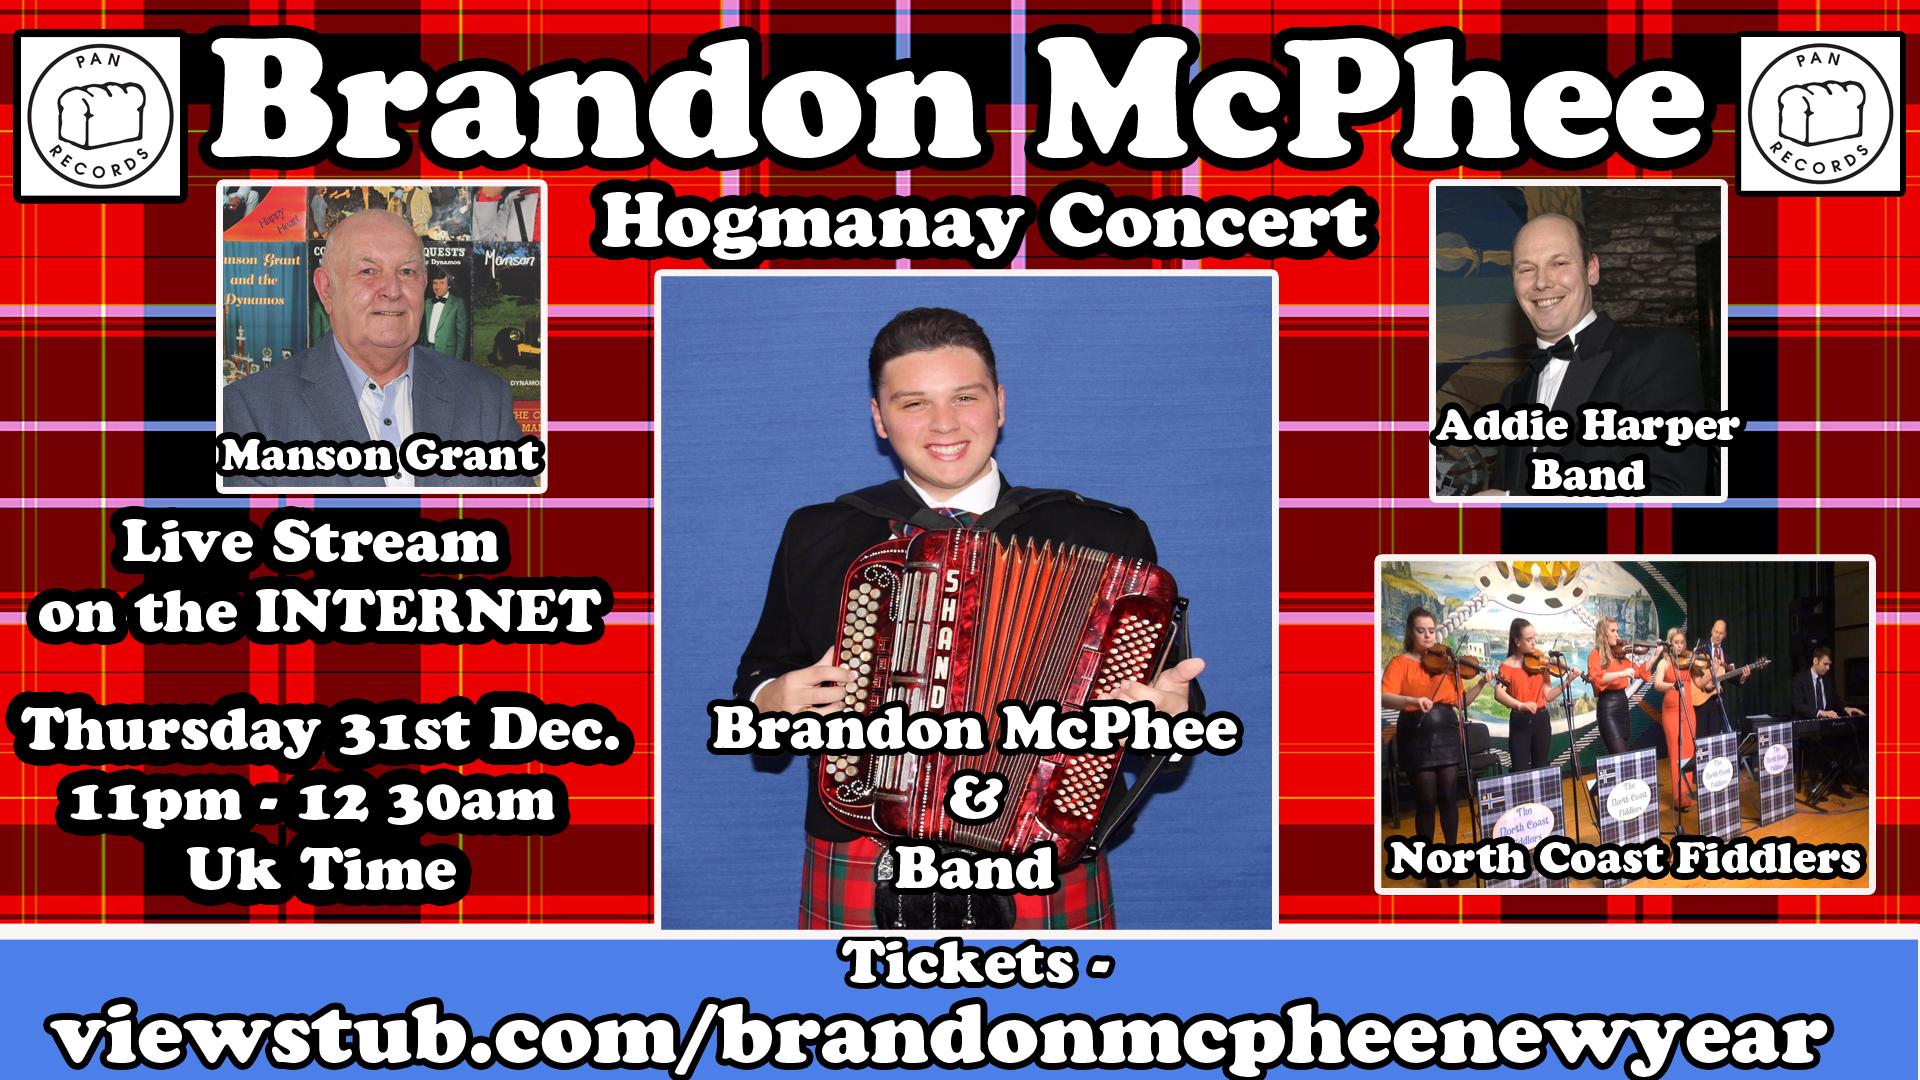 Photo for Brandon Mcphee Scottish Hogmanay Concert on ViewStub